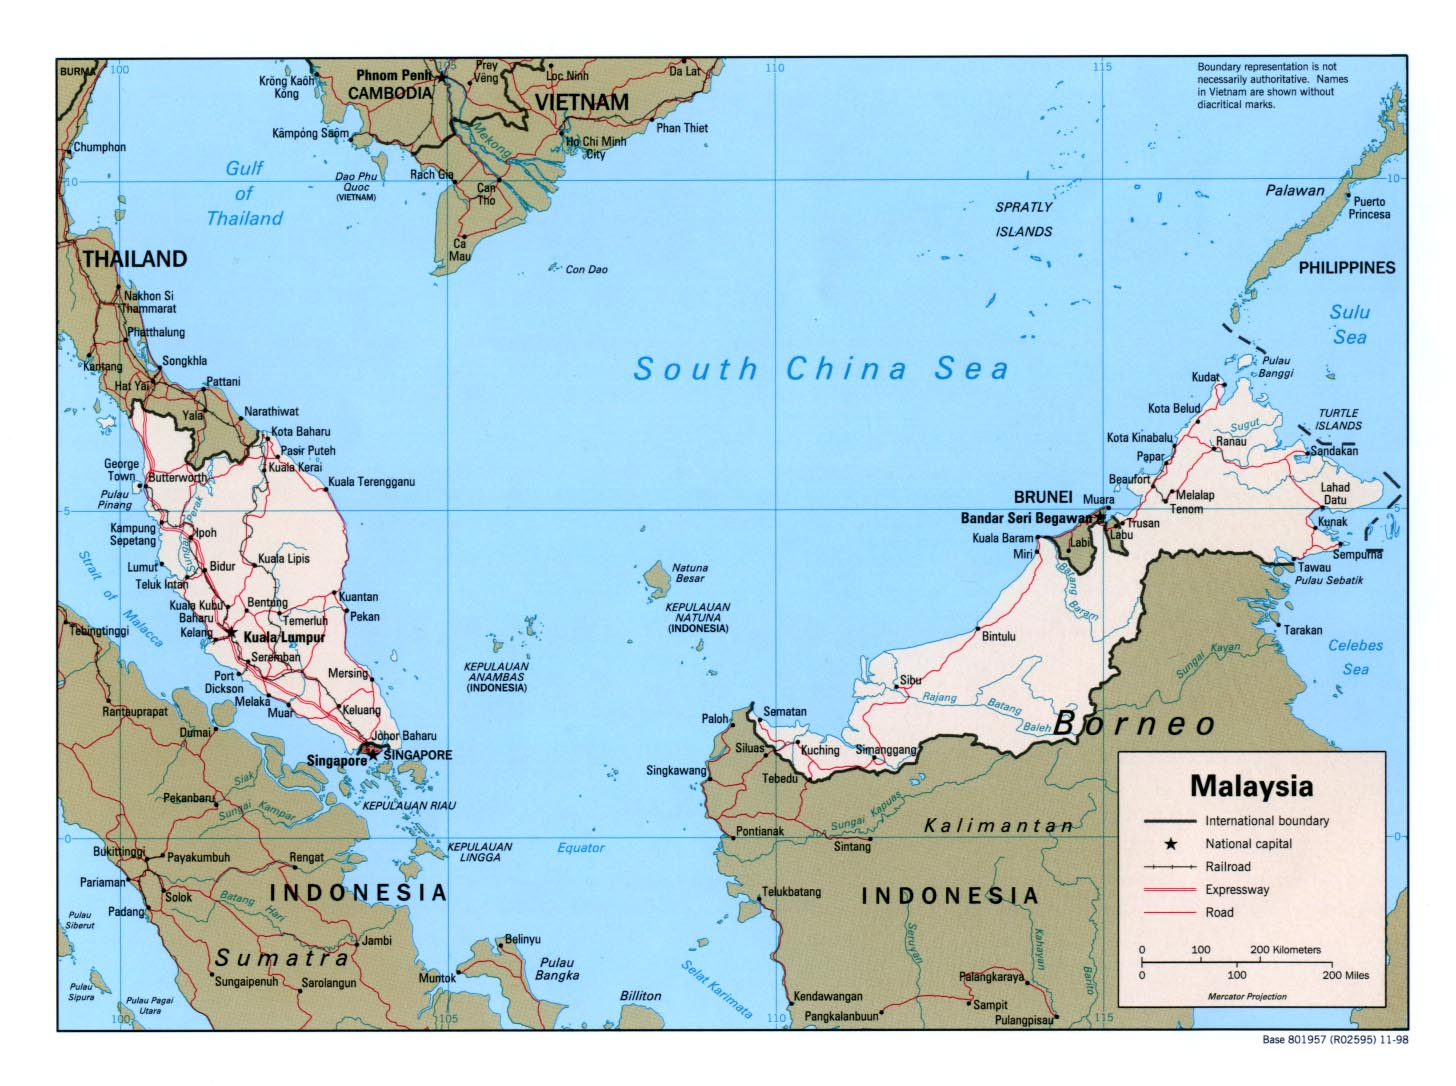 Malaysia Maps - Perry-Castañeda Map Collection - UT Liry ... on thailand map, selangor map, pacific islands map, holland map, china map, armenia map, iran map, phillipines map, united kingdom map, japan map, sarawak map, chile map, singapore on map, world map, ukraine map, ireland map, europe map, kota kinabalu map, yemen map, australia map, cyprus map, french polynesia map, georgia map,